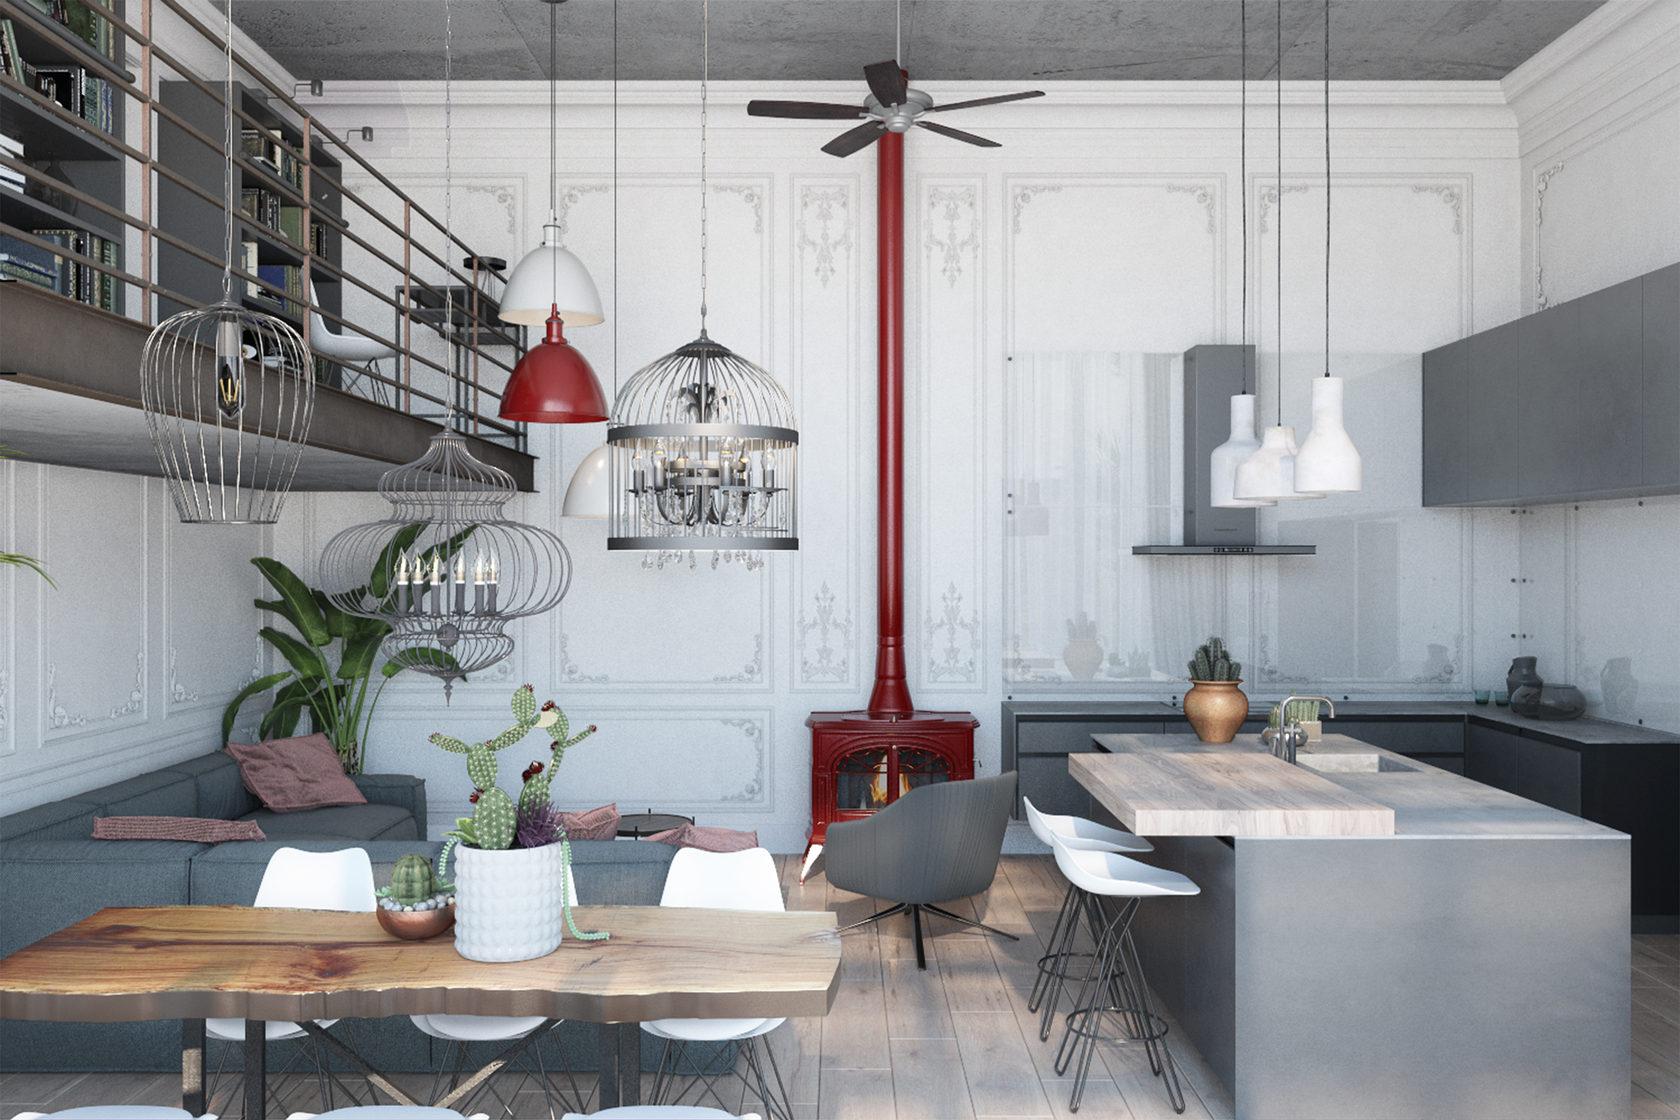 Проект: The Alina House<br />Компанія: Solmaz Primavera